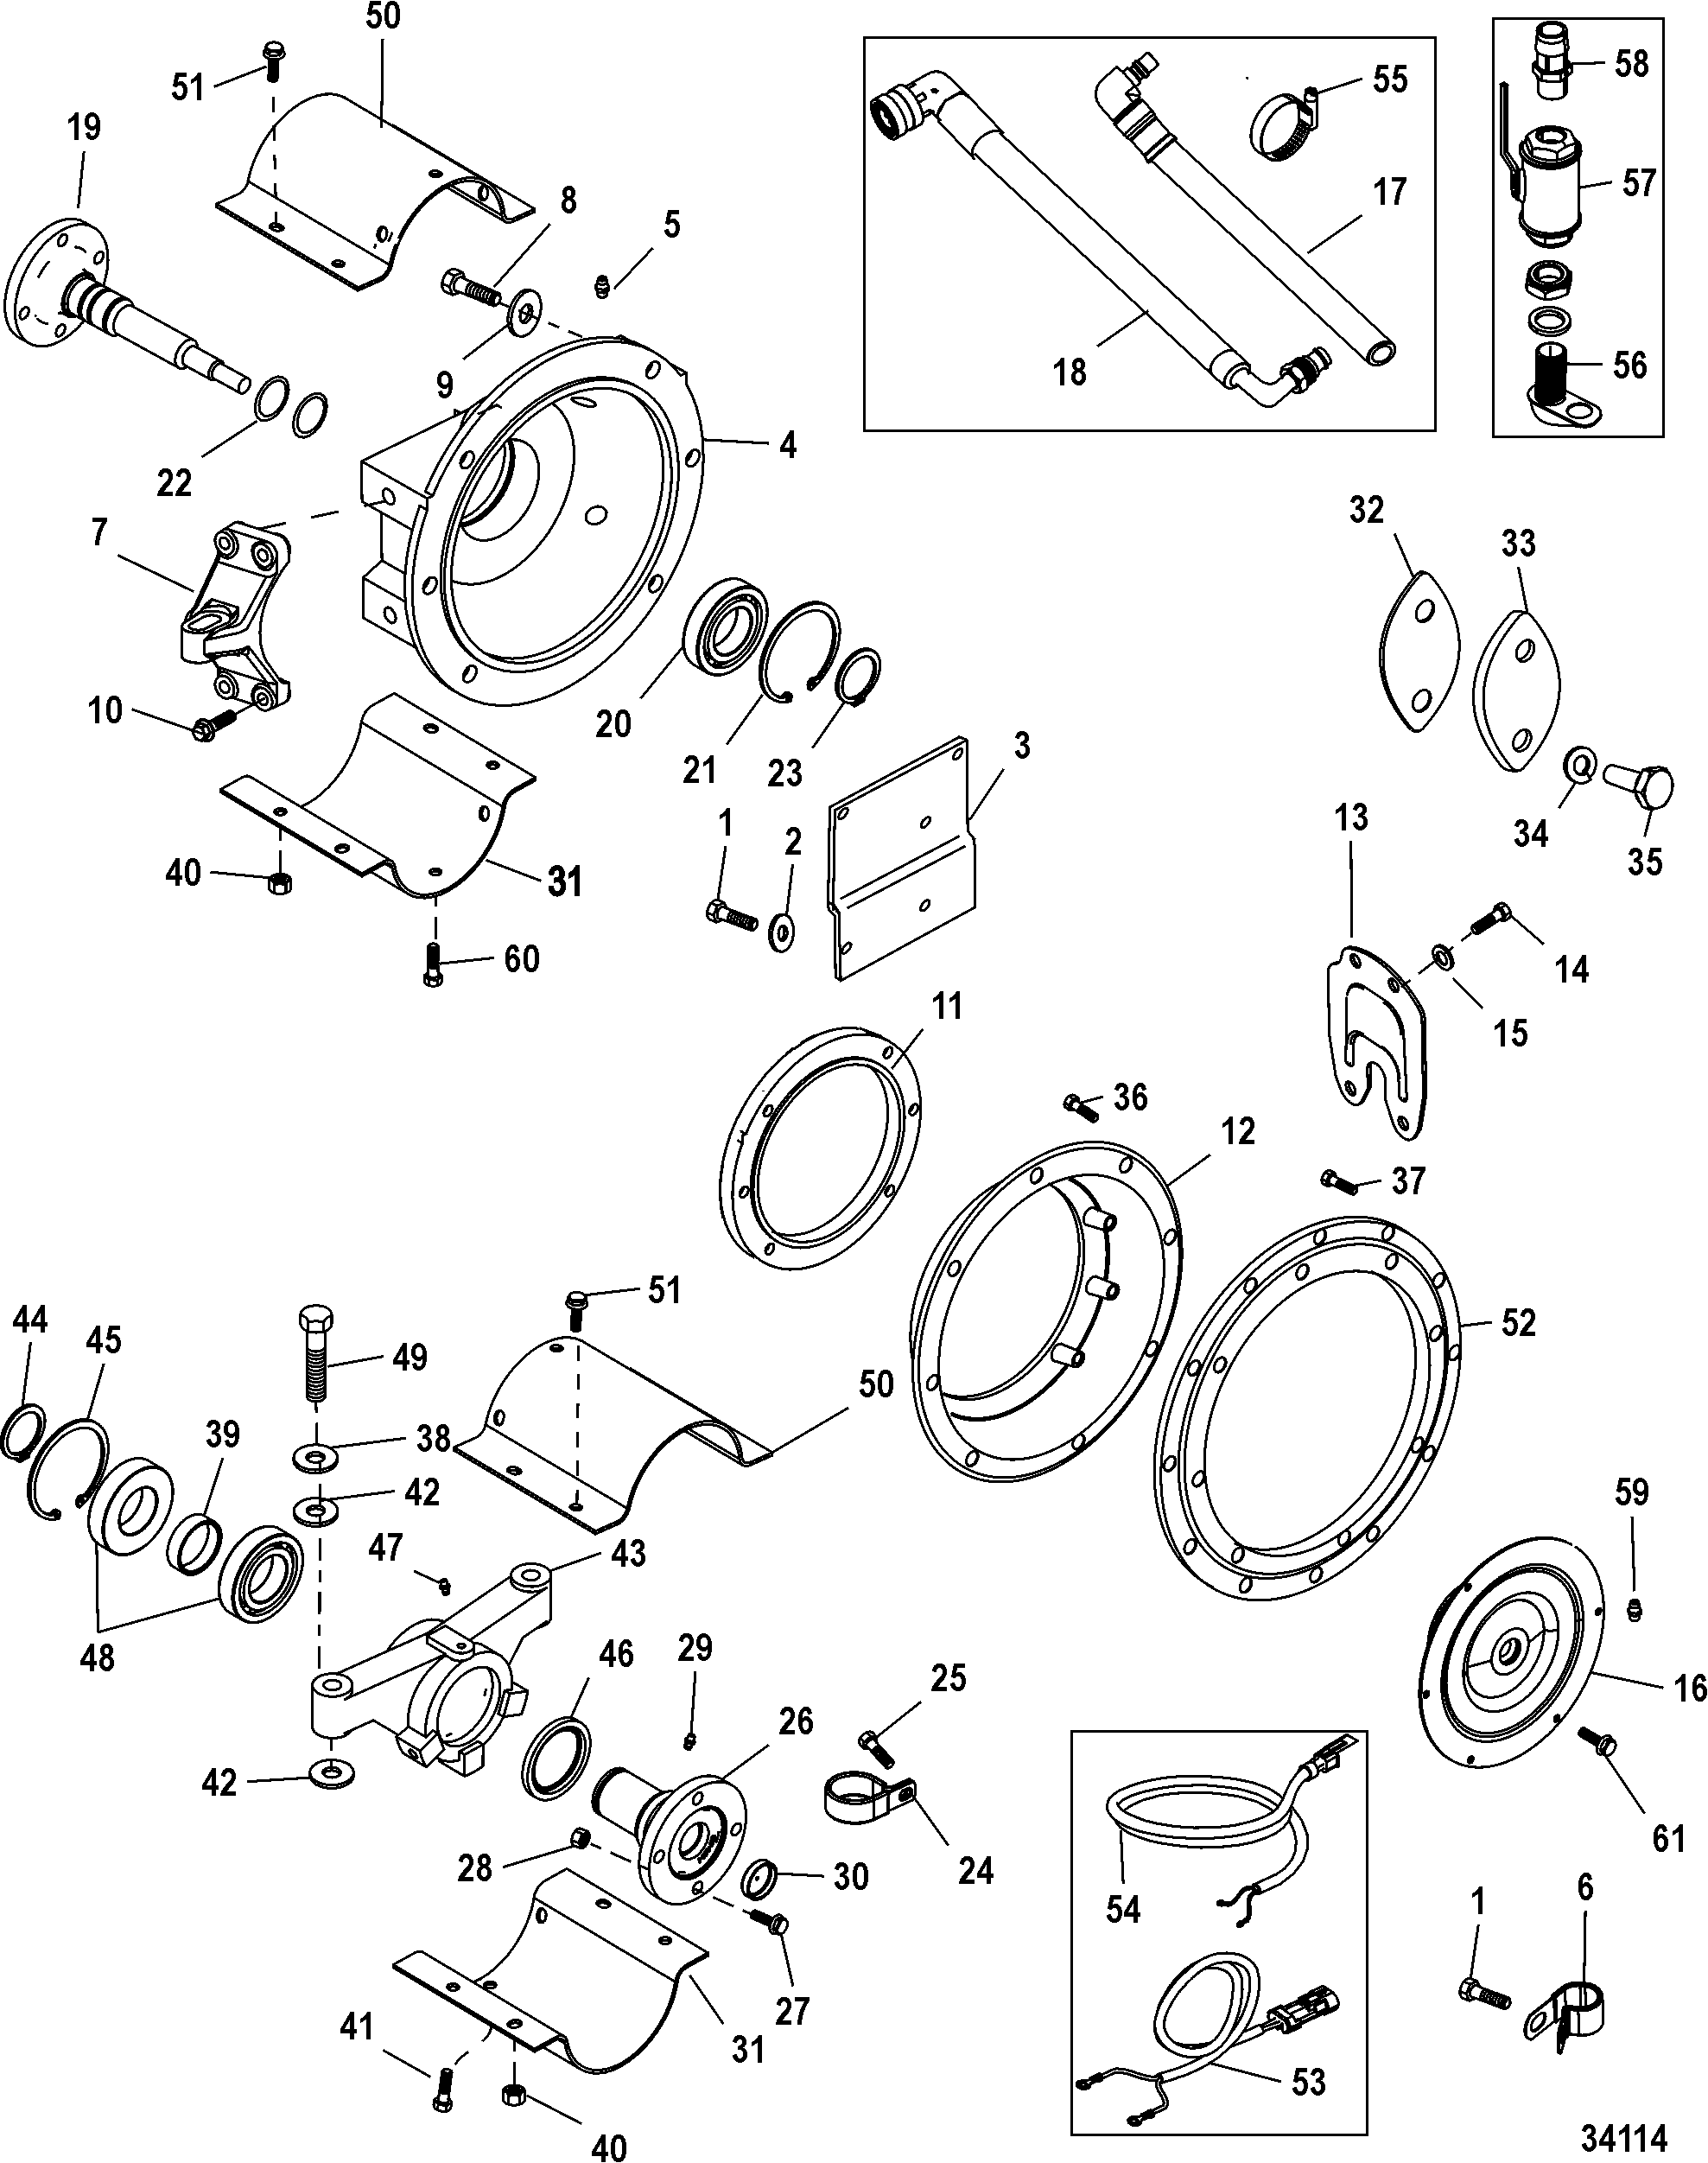 Jackshaft Components For Mercruiser Mie Cummins